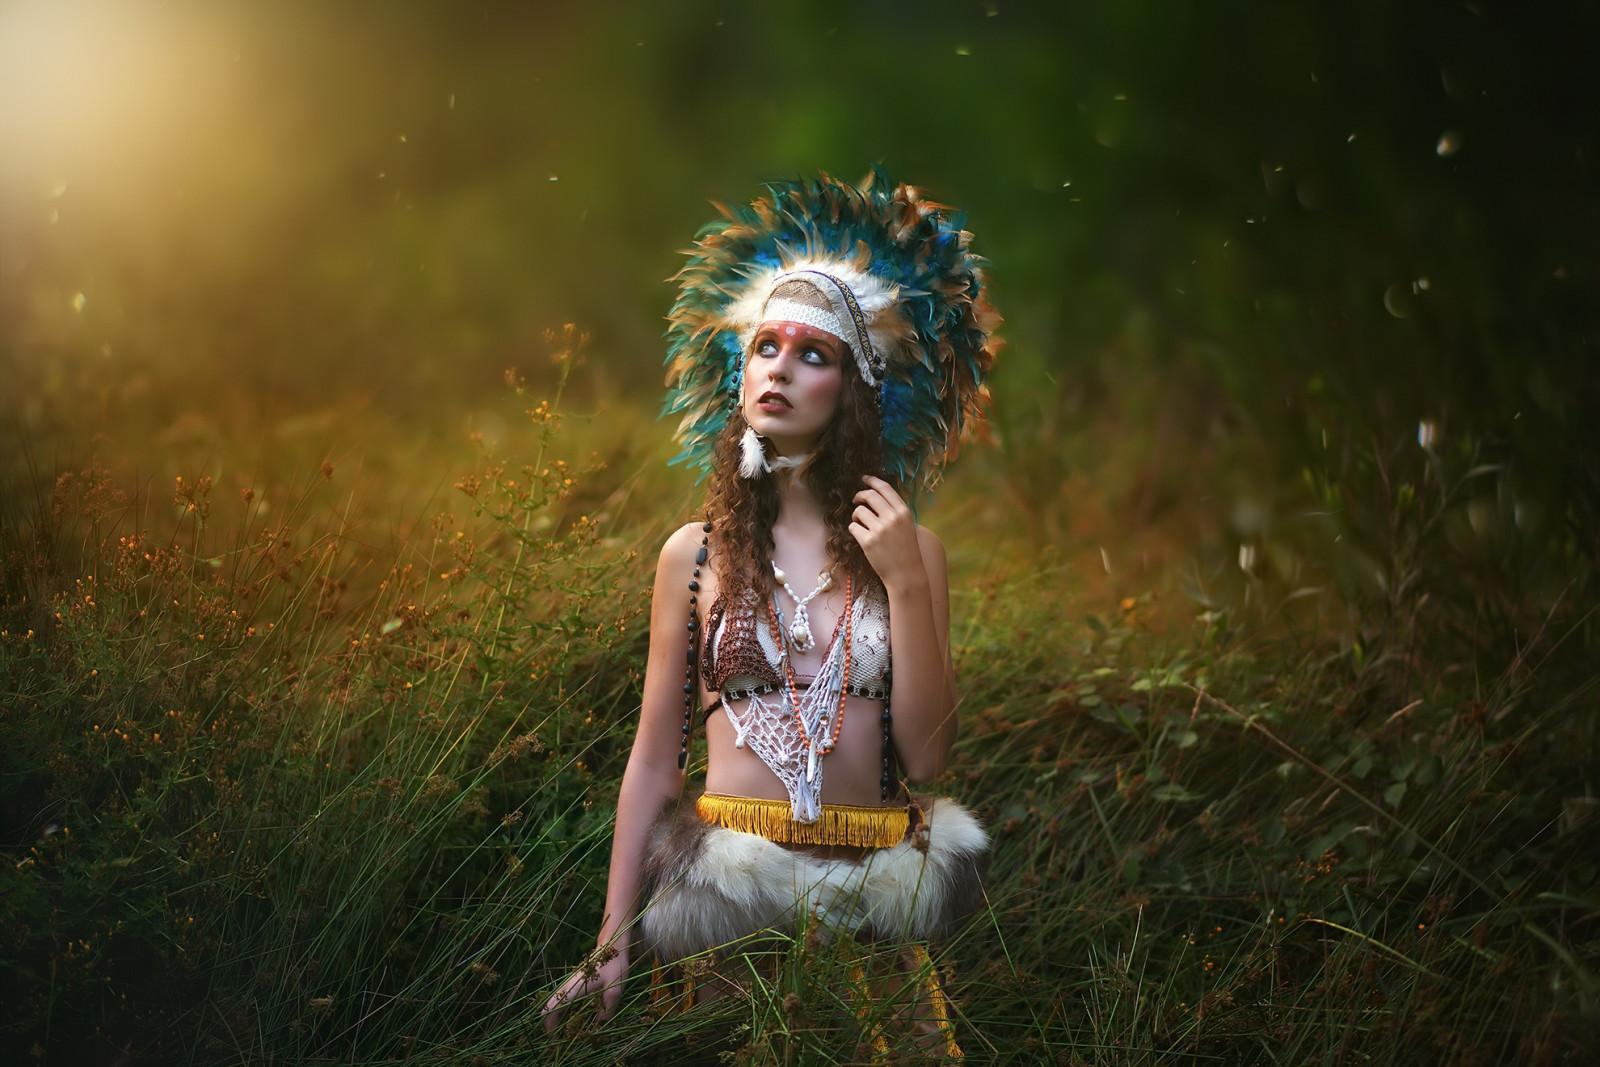 women Outdoors, Model, Women, Fantasy Art, Nature